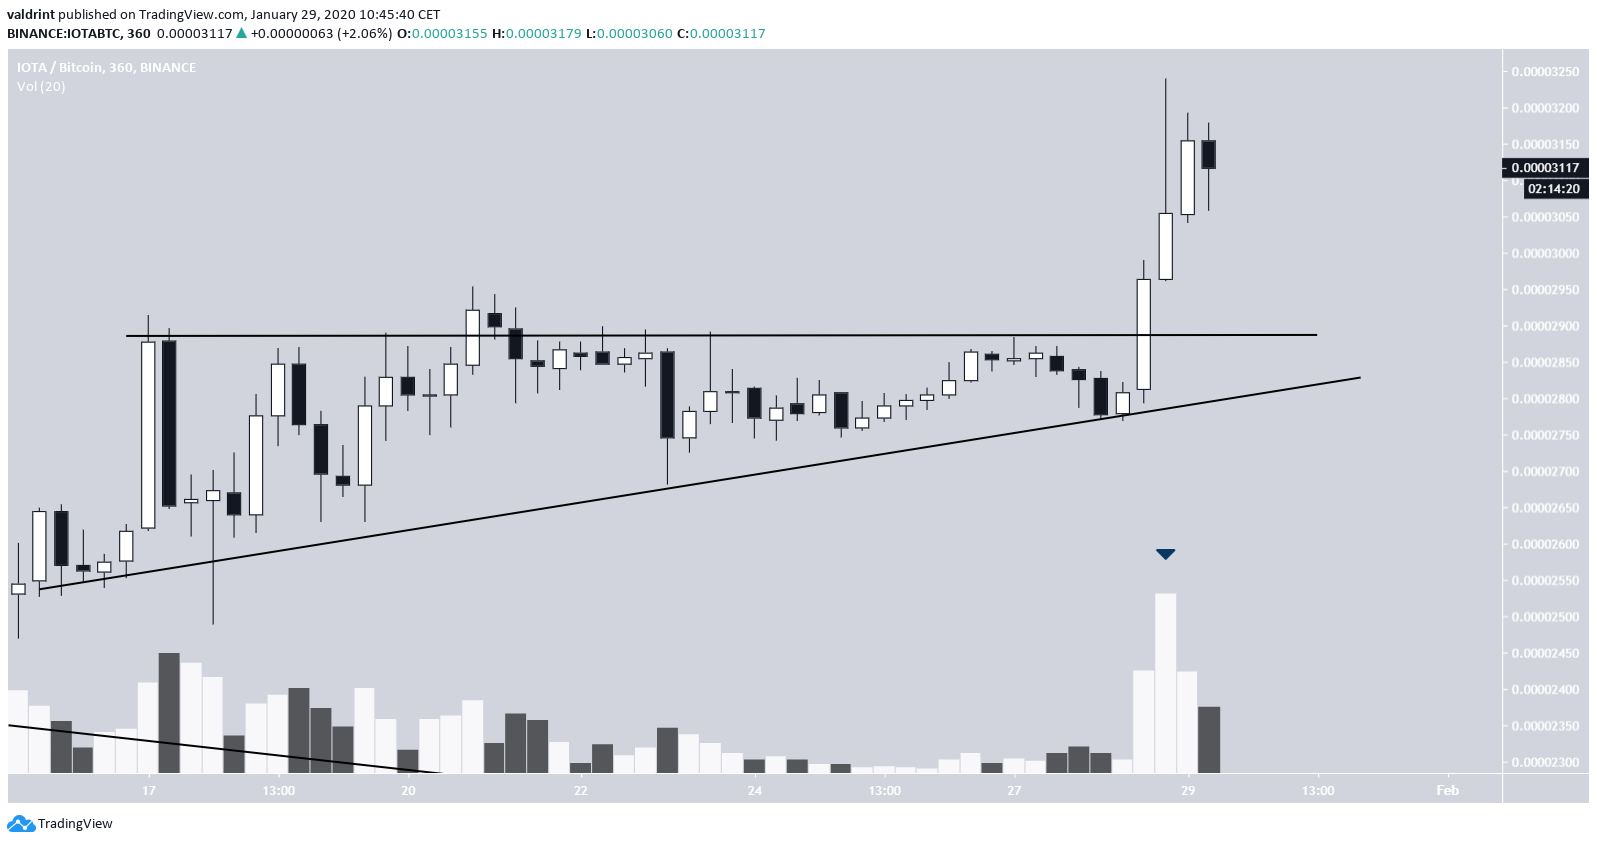 IOTA Ascending Triangle Breakout